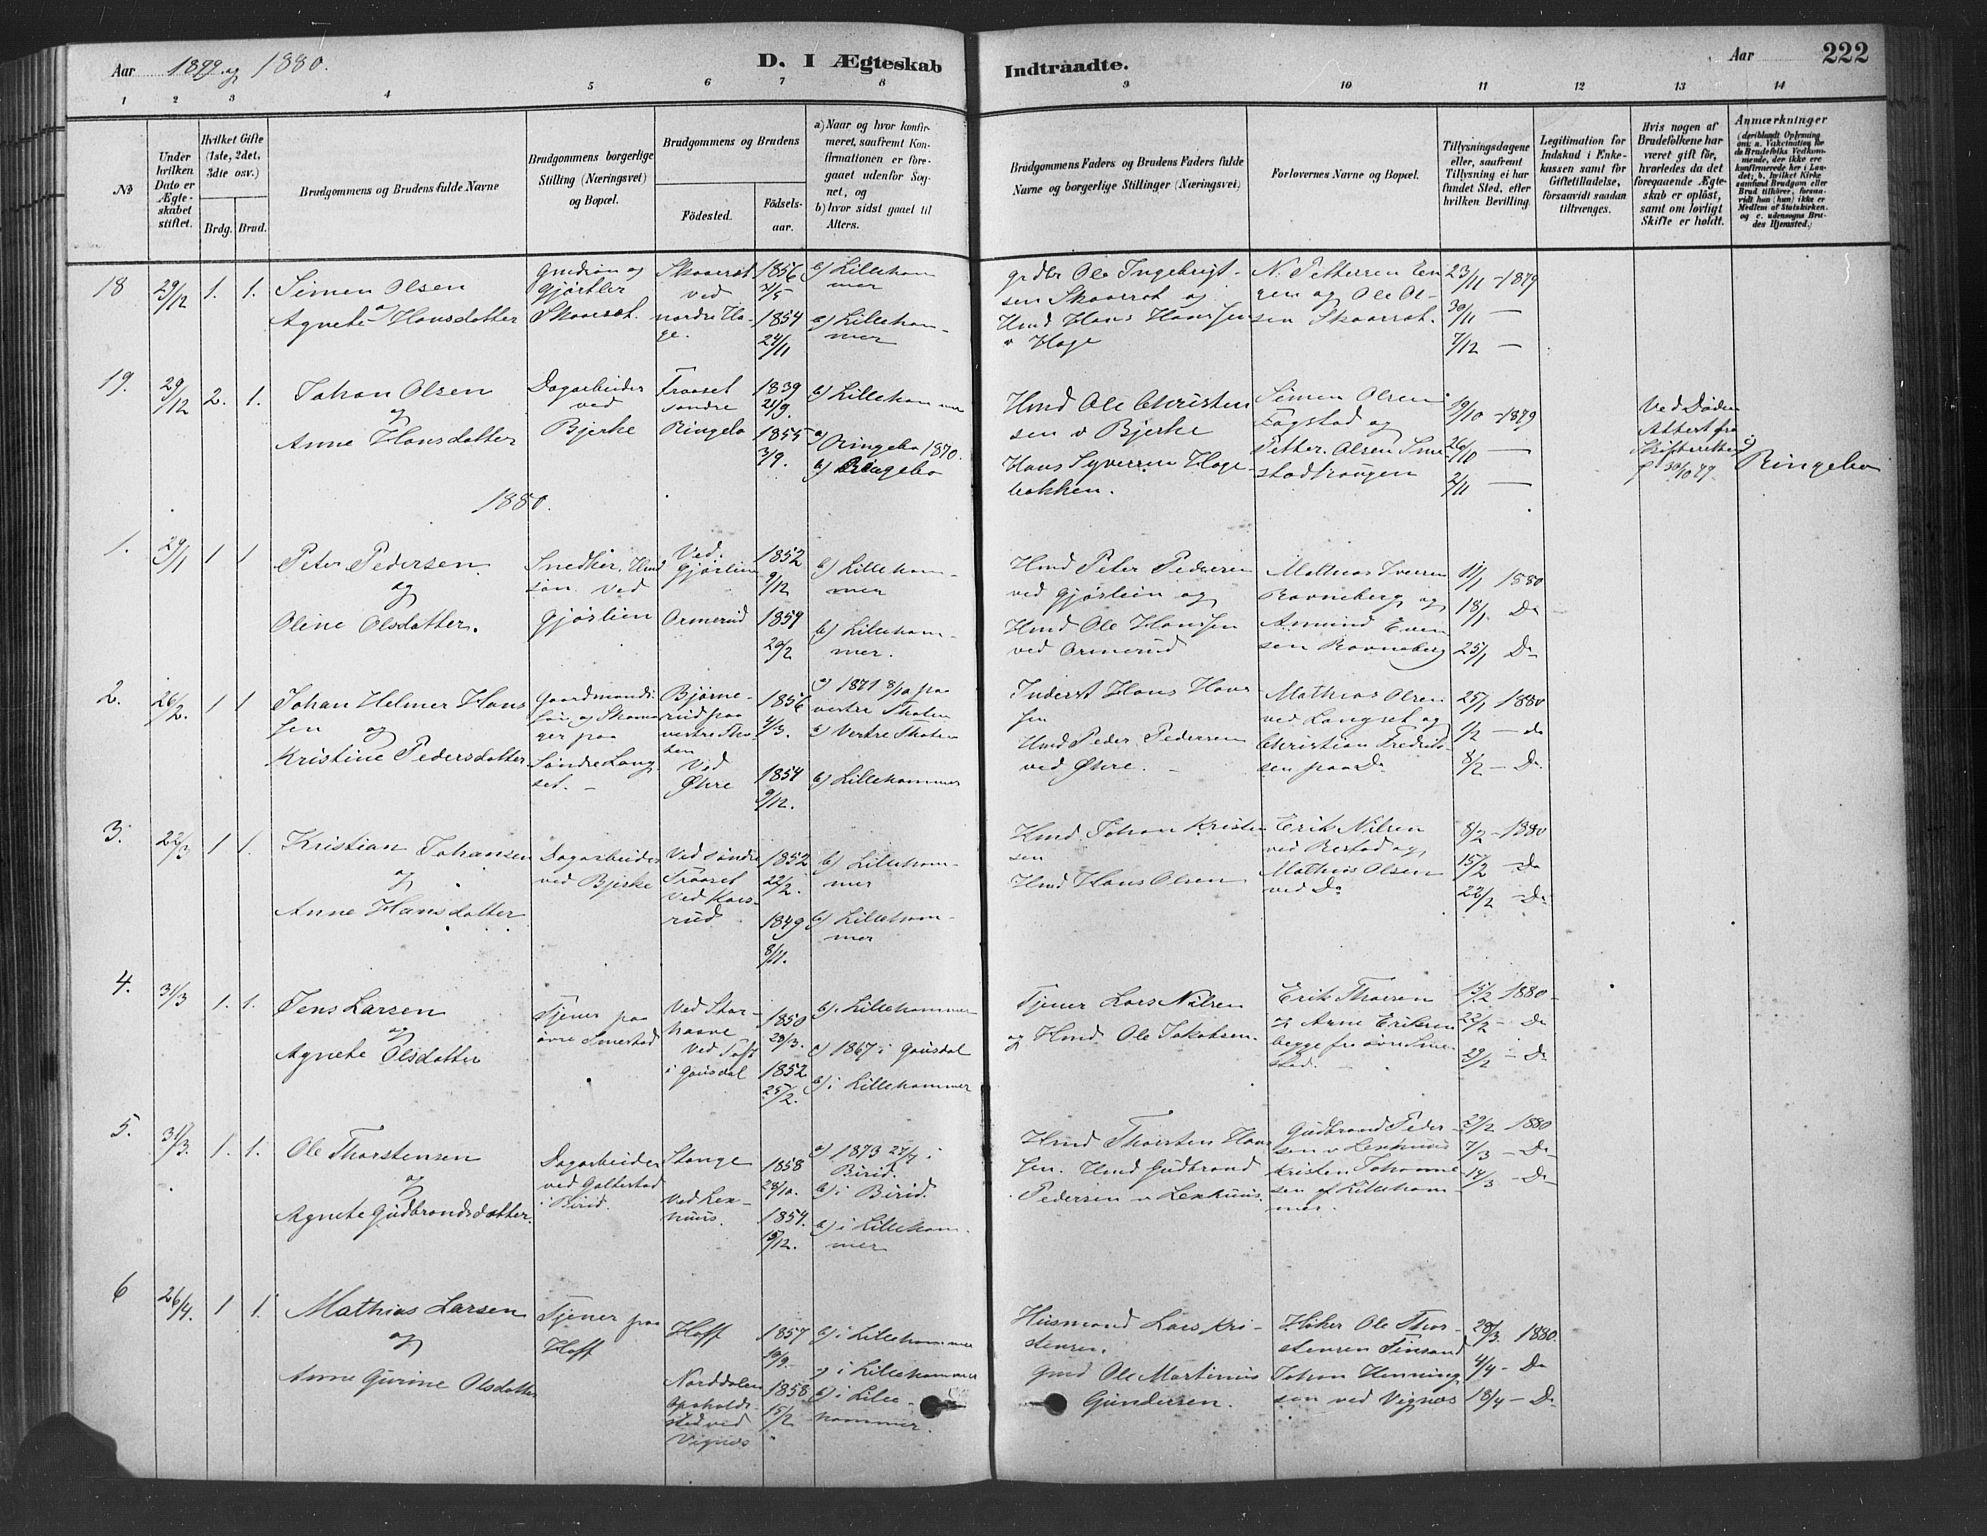 SAH, Fåberg prestekontor, Ministerialbok nr. 9, 1879-1898, s. 222